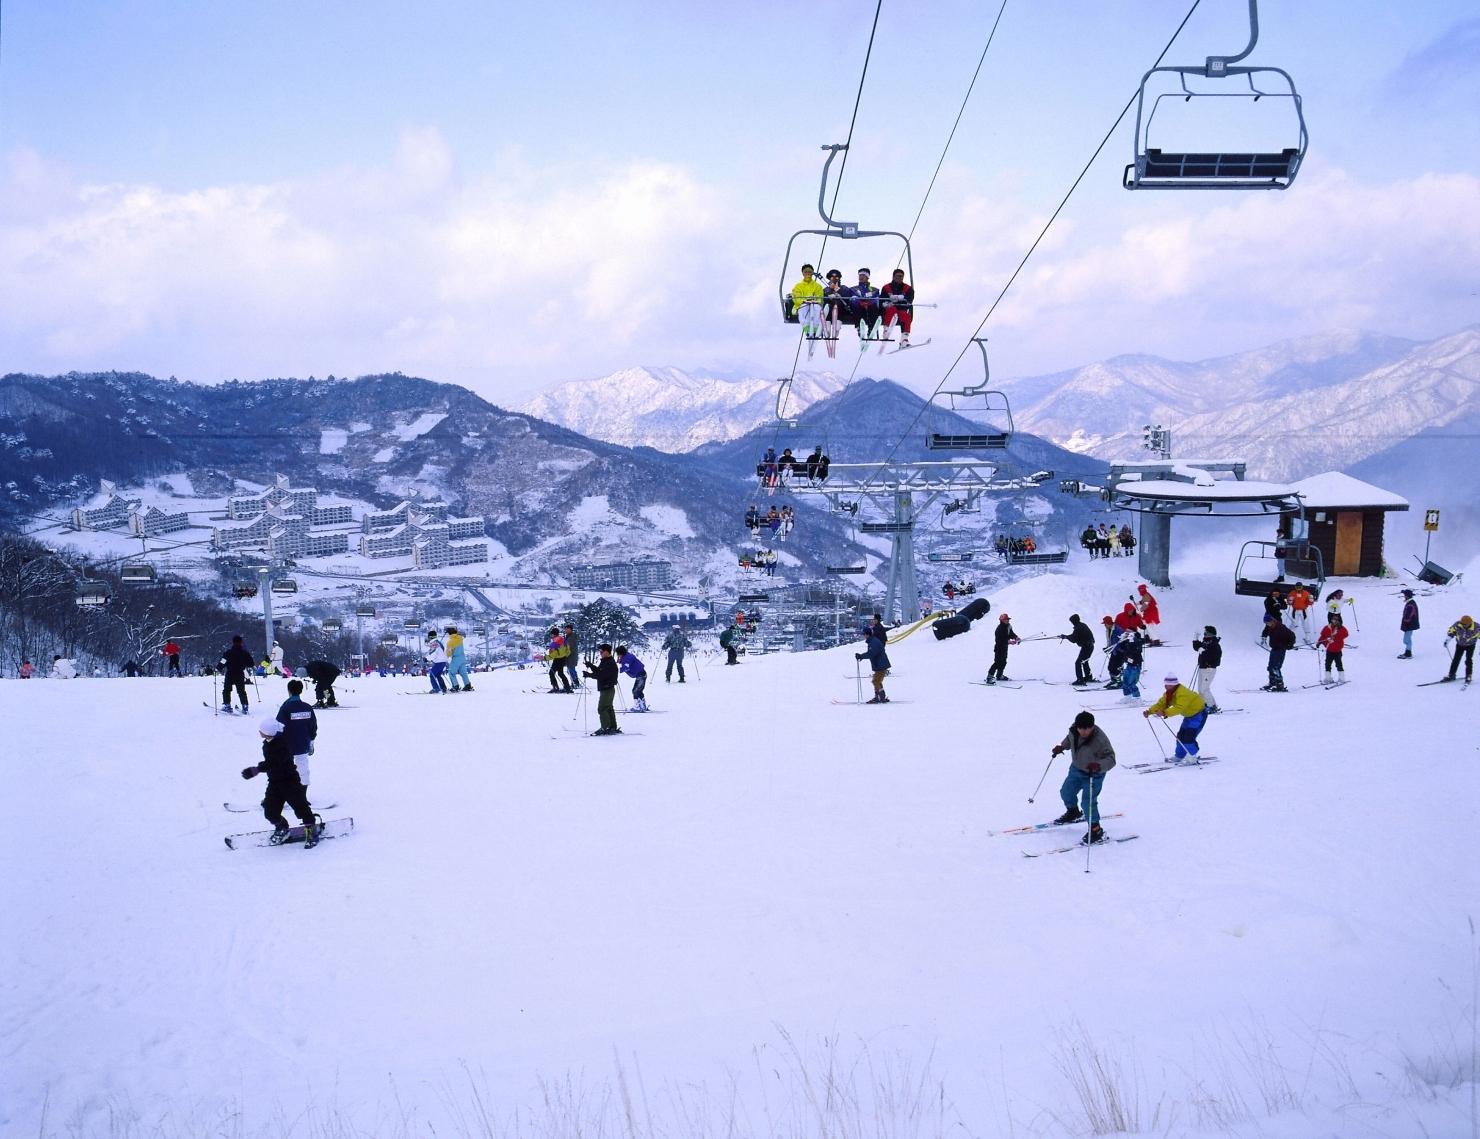 korea e tour korea ski tour. Black Bedroom Furniture Sets. Home Design Ideas